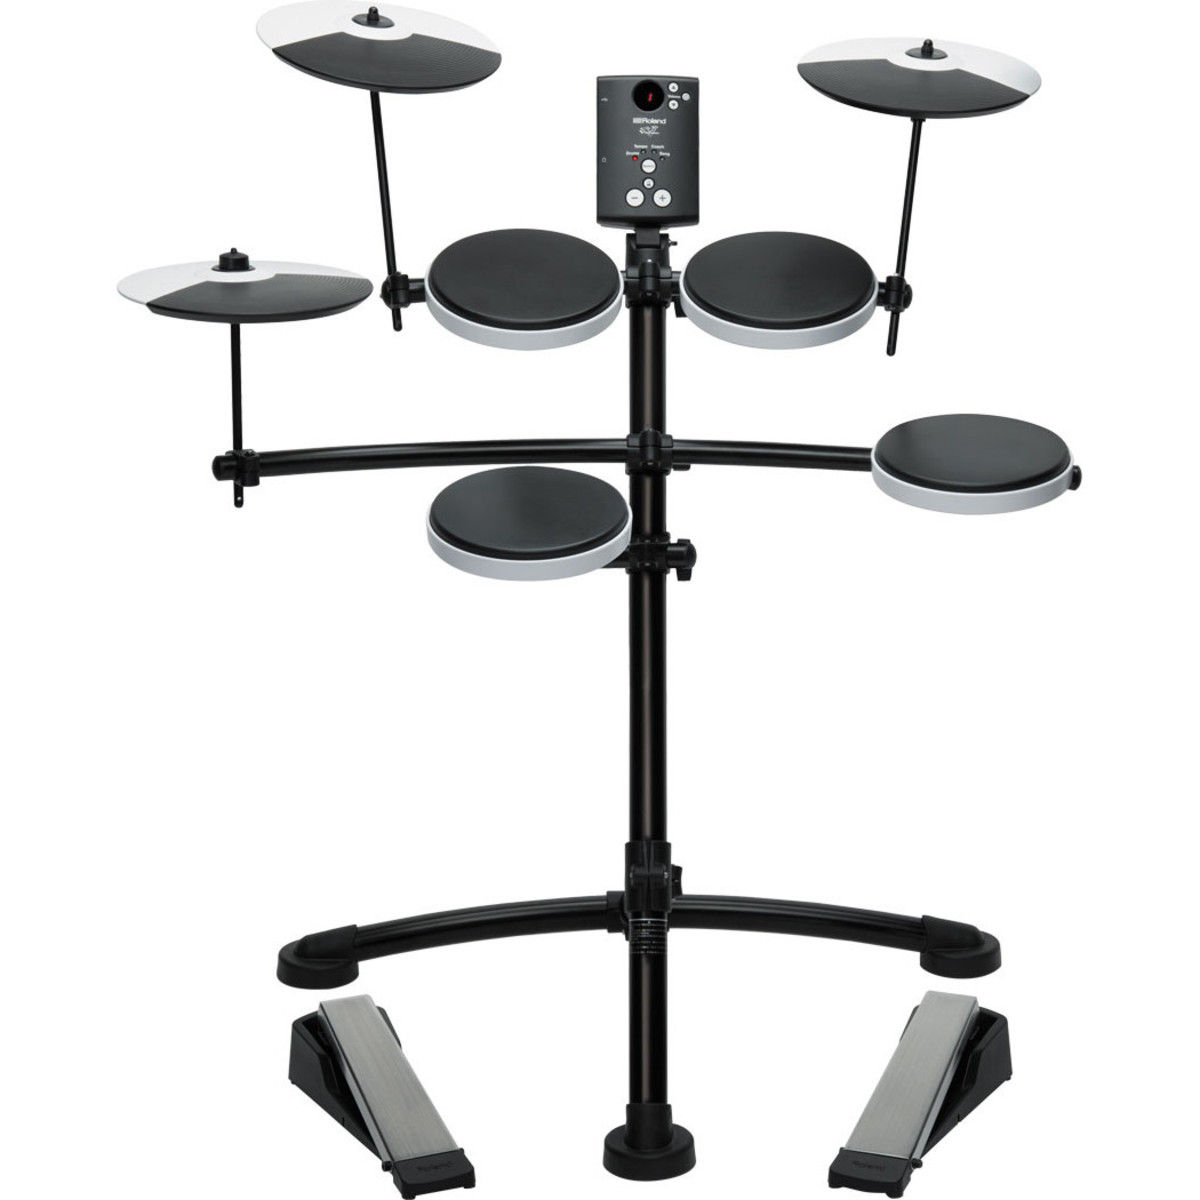 Roland Td 1k V Drums Electronic Drum Kit At Gear4music